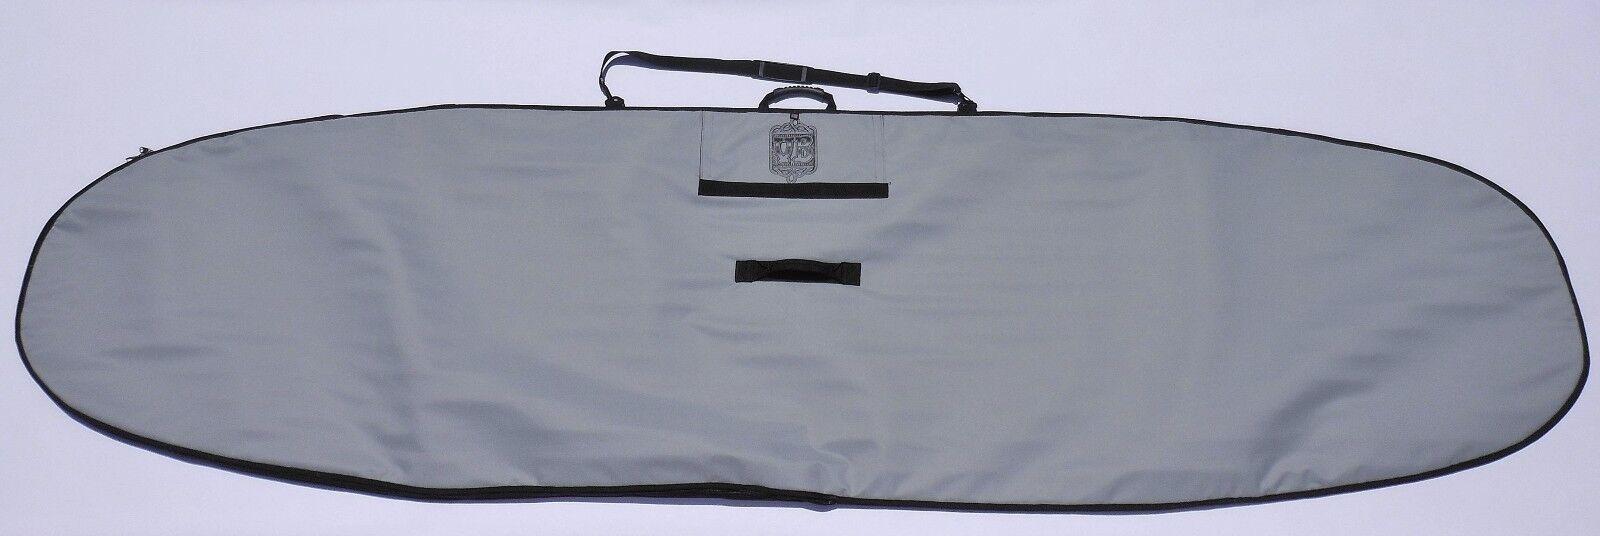 Vitamin bluee 10'0  x 36  SUP Bag (MADE in U.S.A.) by Vitamin bluee